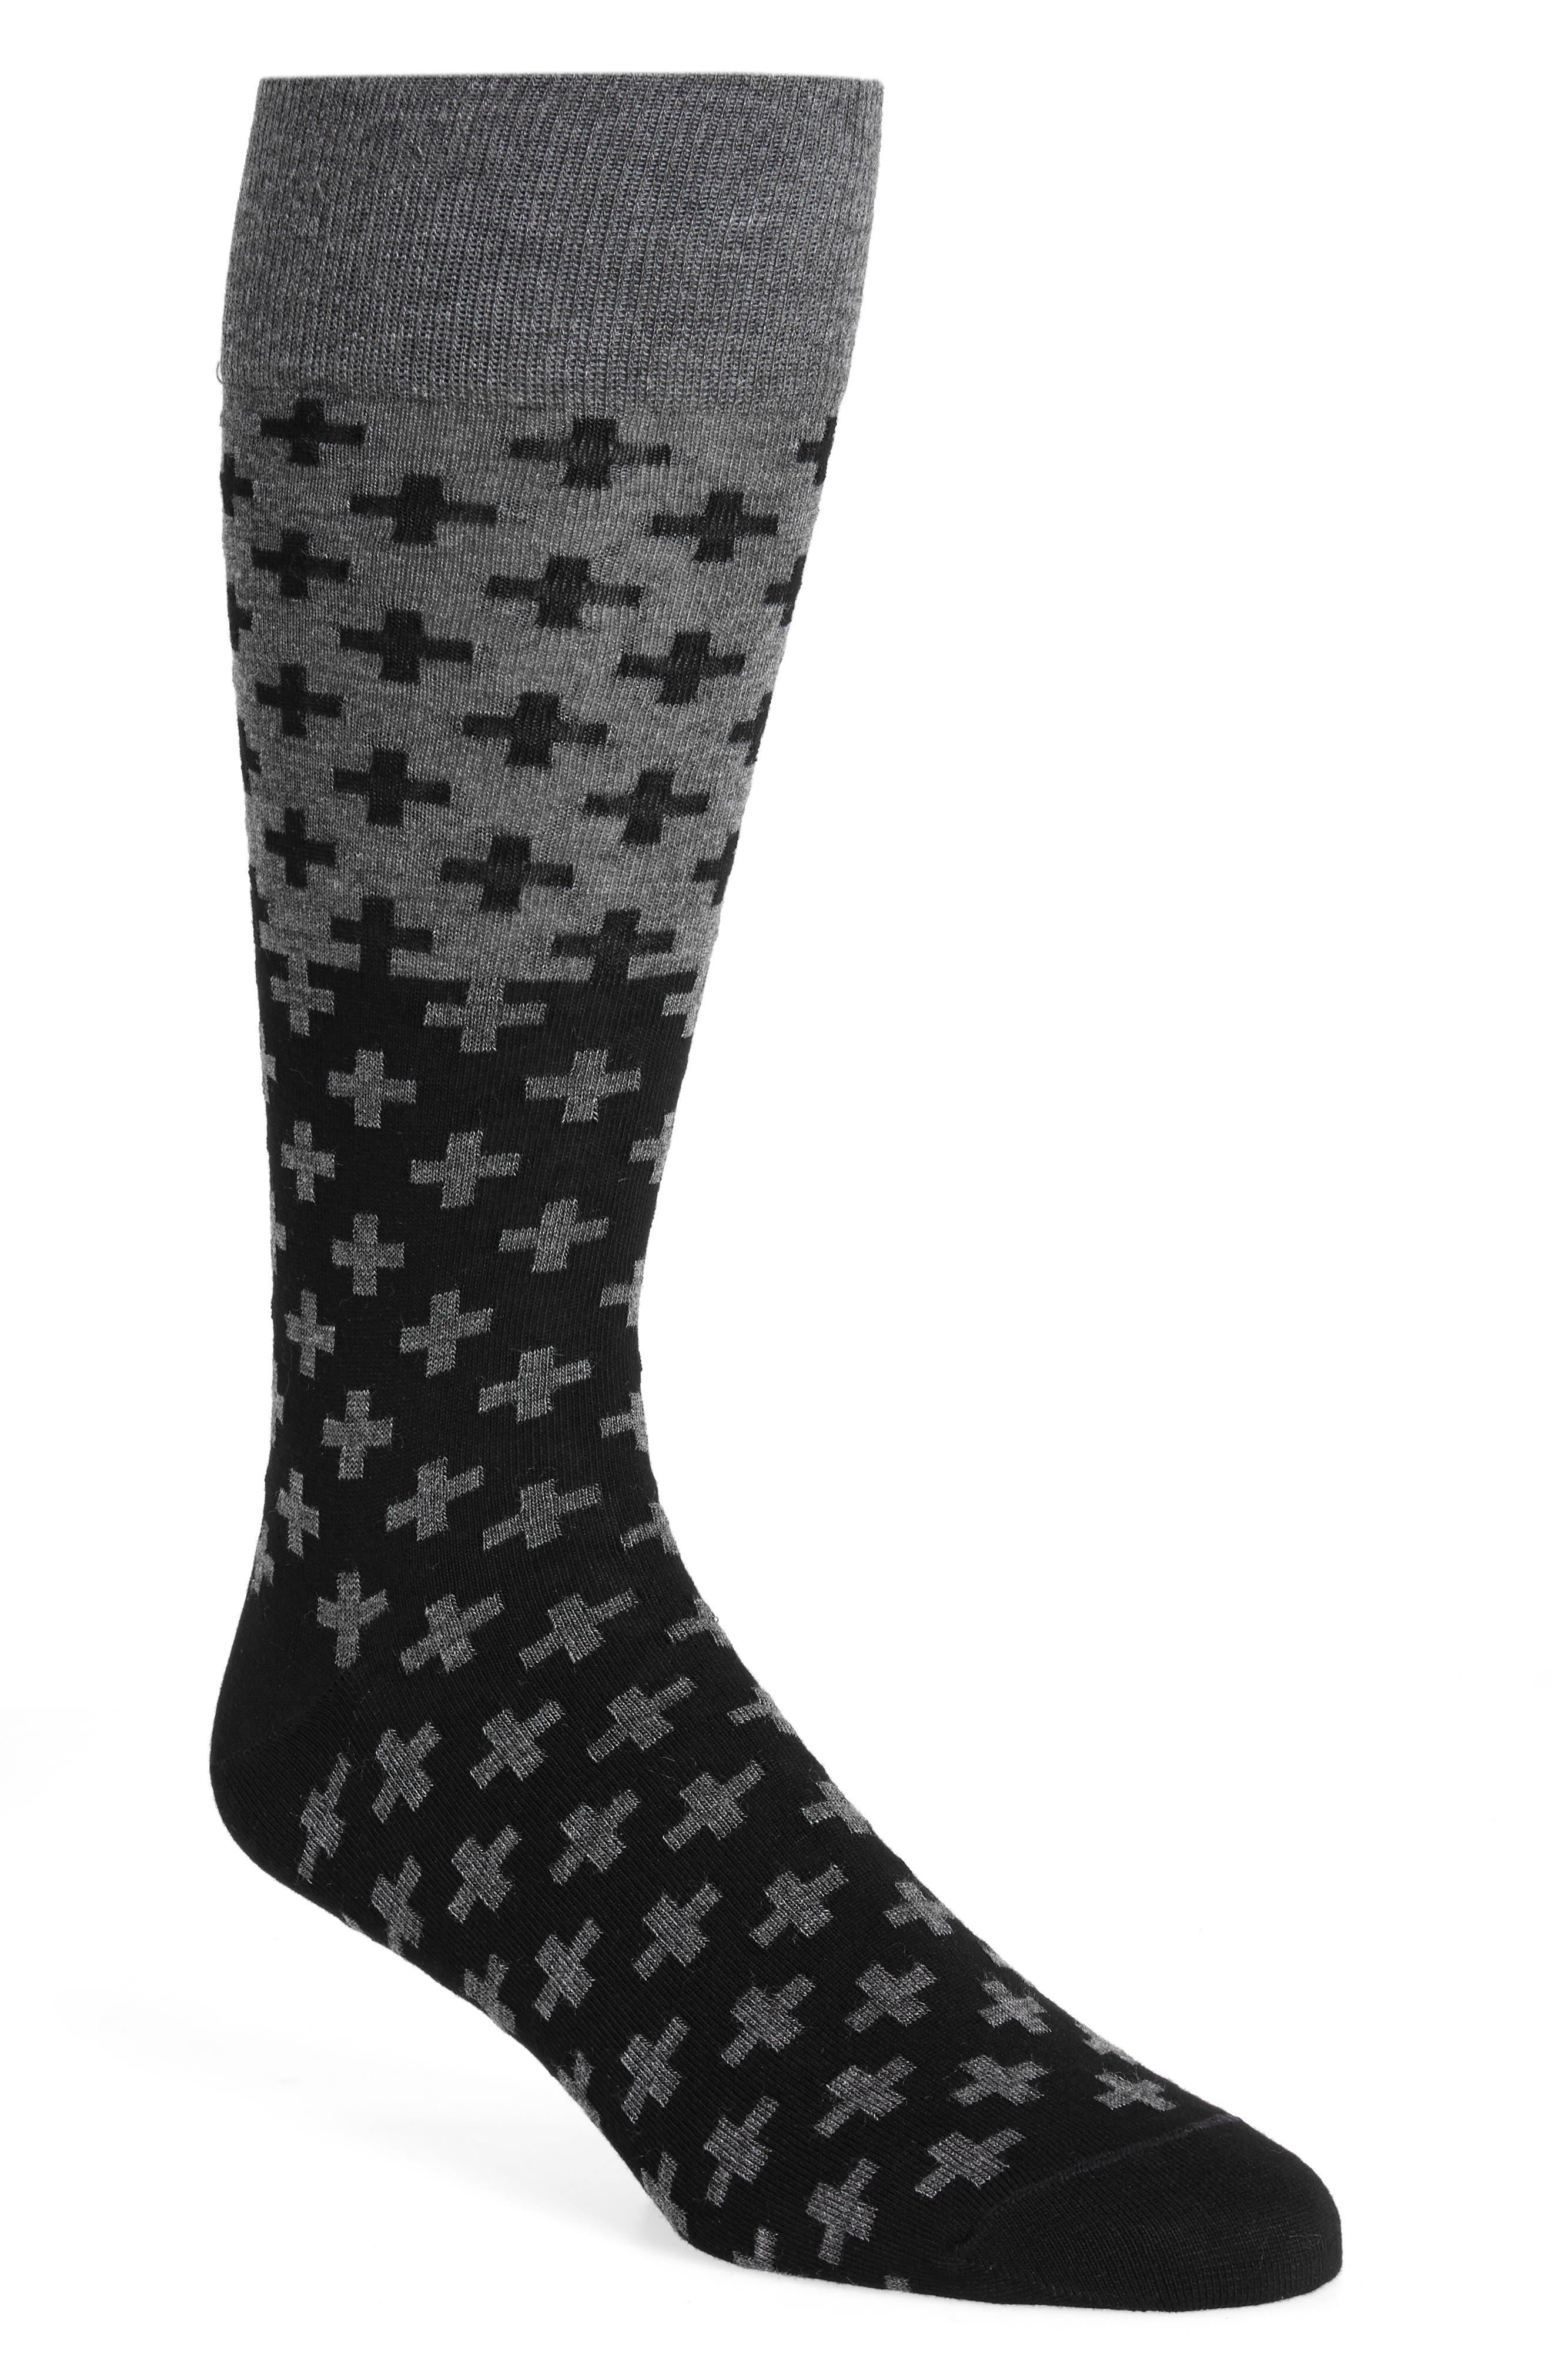 Alternate Image 1 Selected - Calibrate Cross Socks (3 for $30)